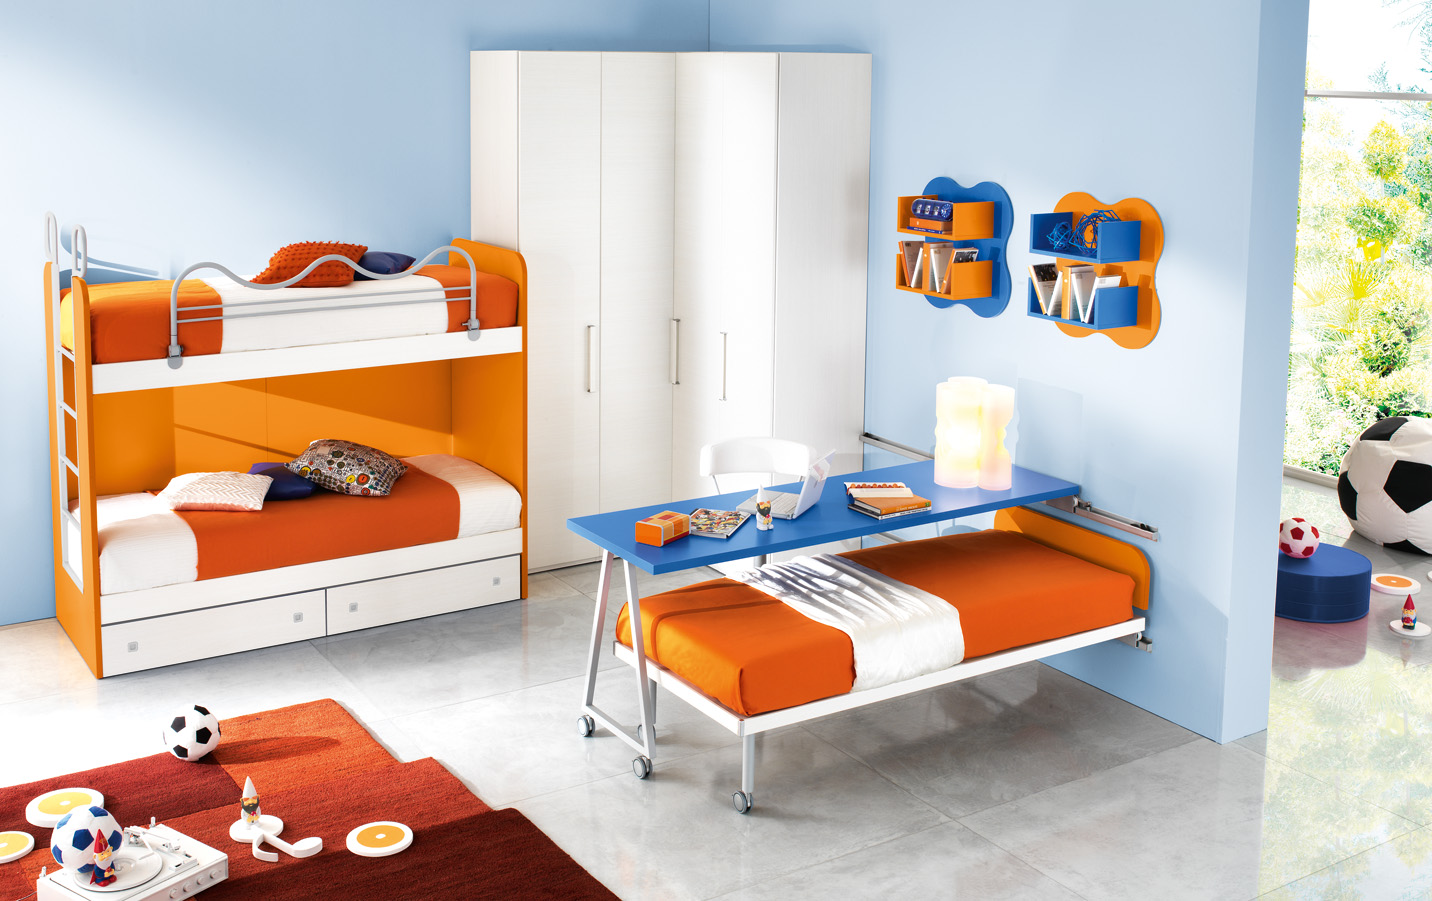 Camere matrimoniali design for Camerette bambini usate